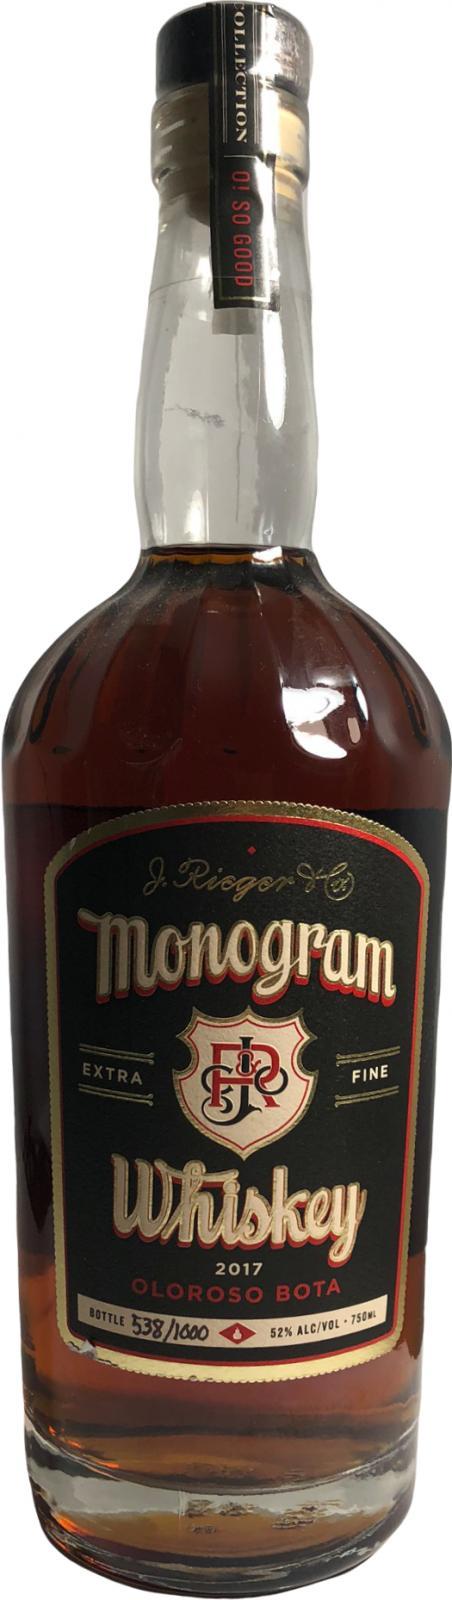 Rieger's Monogram Whiskey